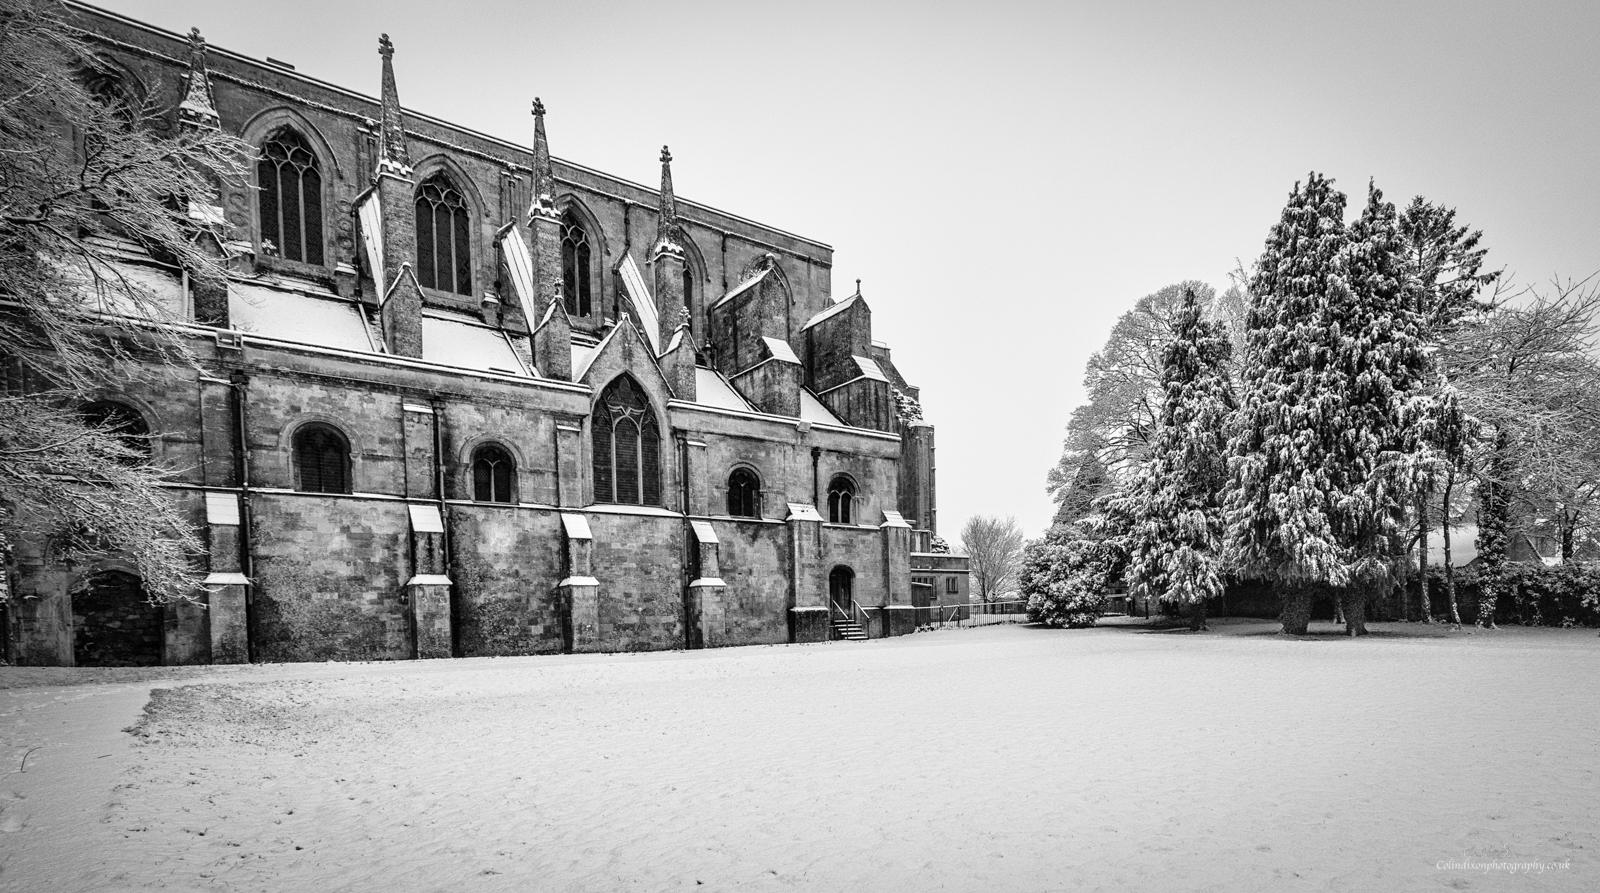 Malmesbury Abbey in the snow